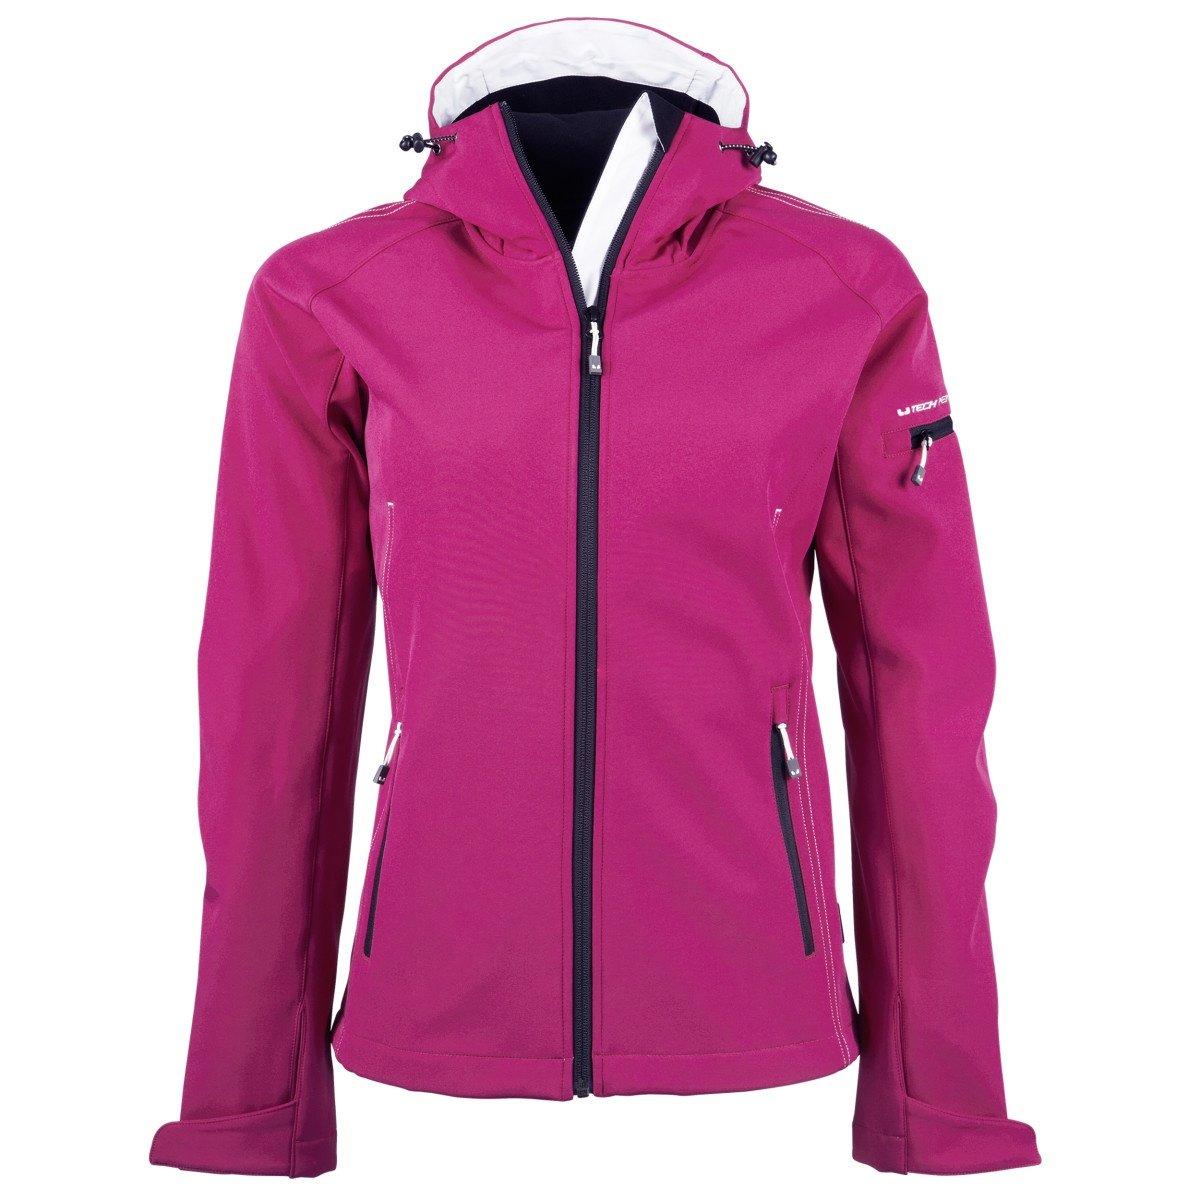 Softshell At Tee Womensladies Jacket Hooded Fashion Jays 8n0ZONkXwP